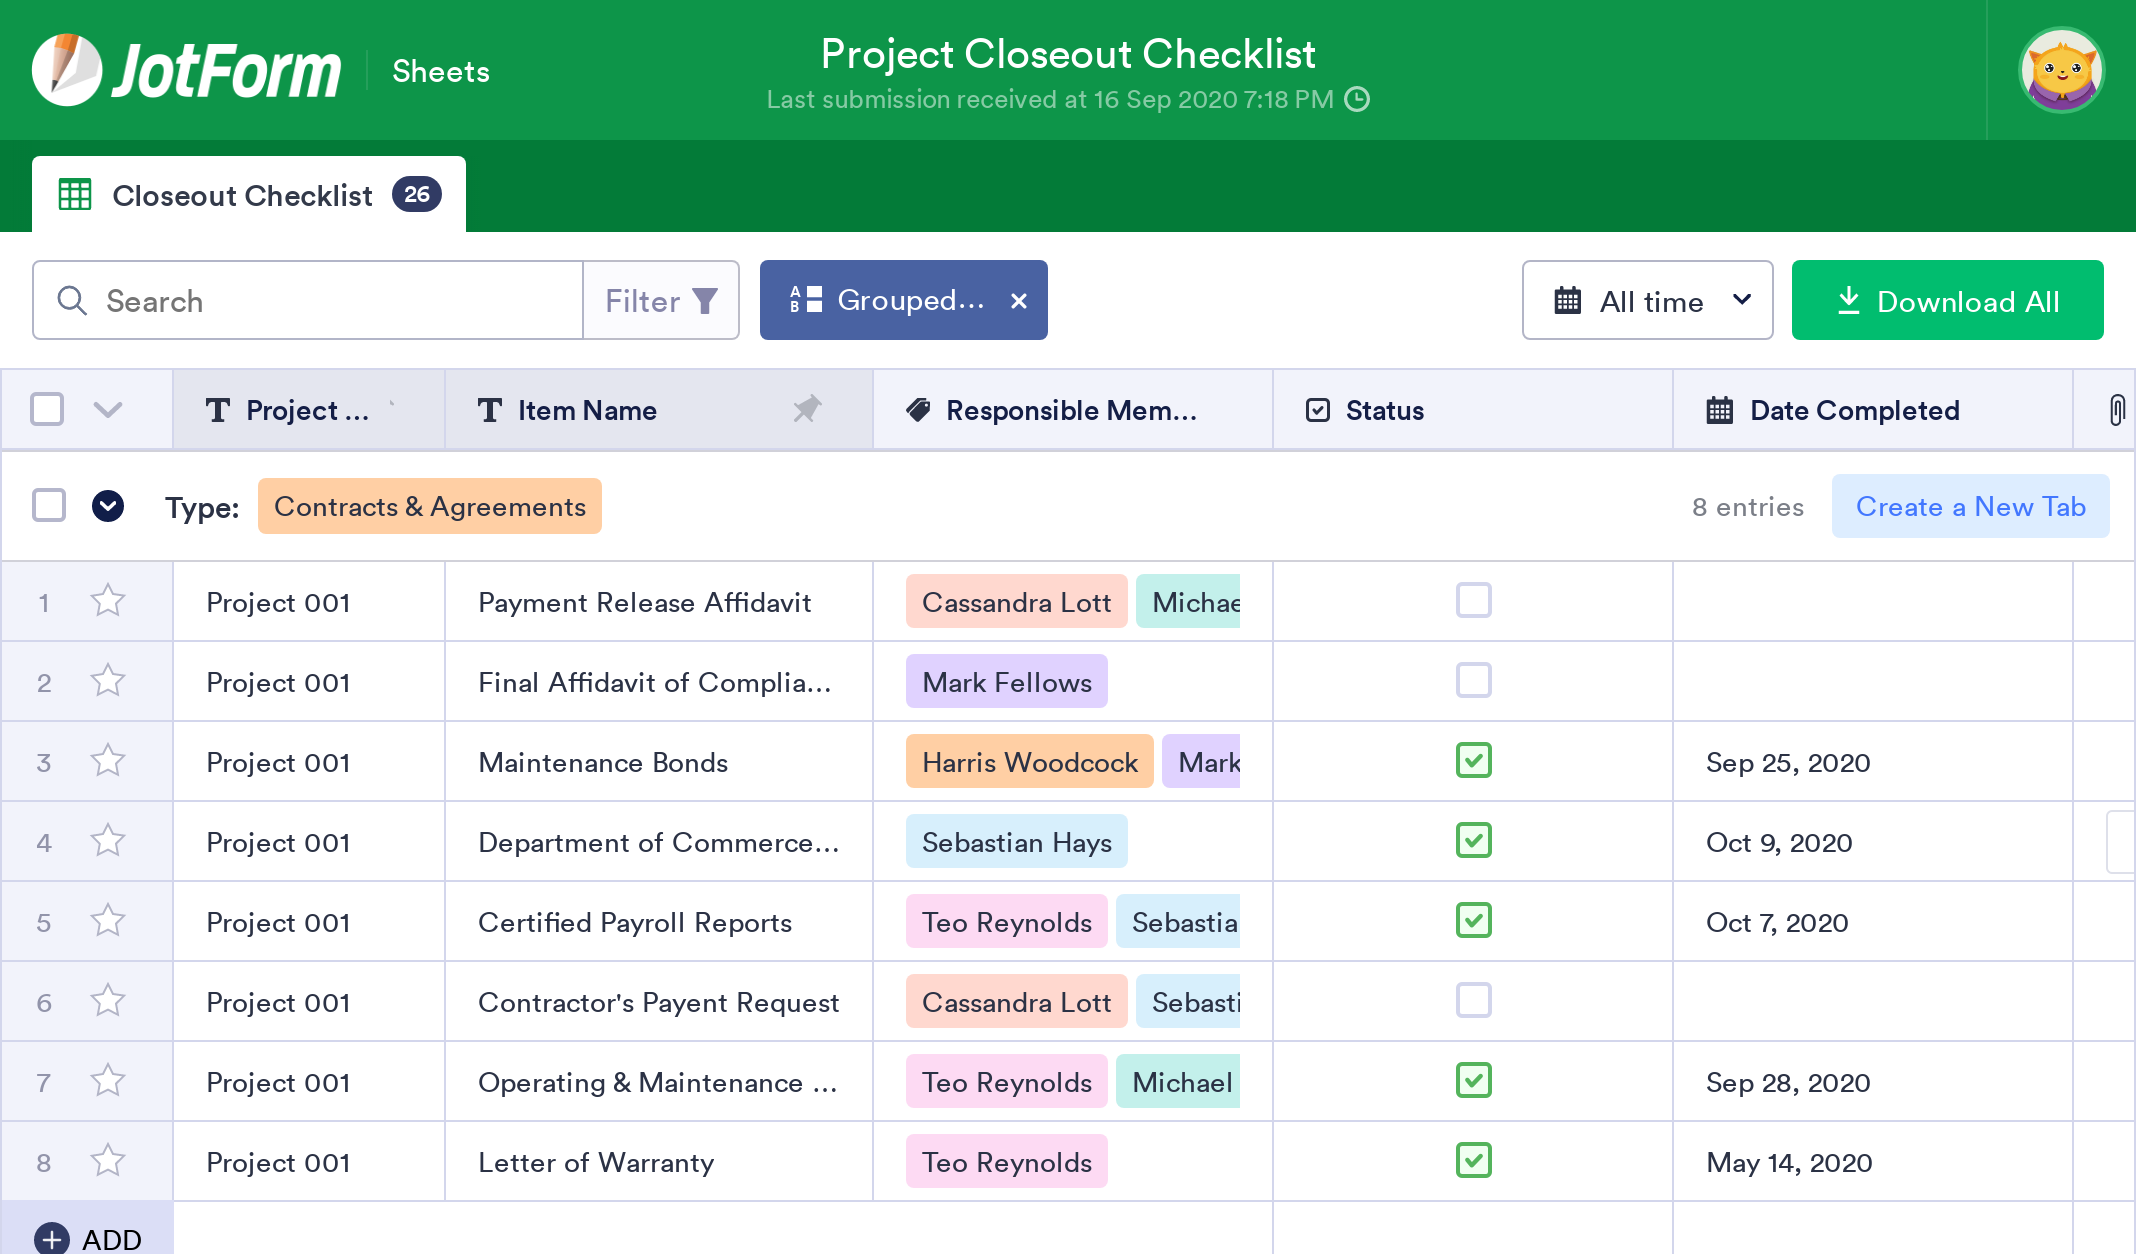 Project Closeout Checklist